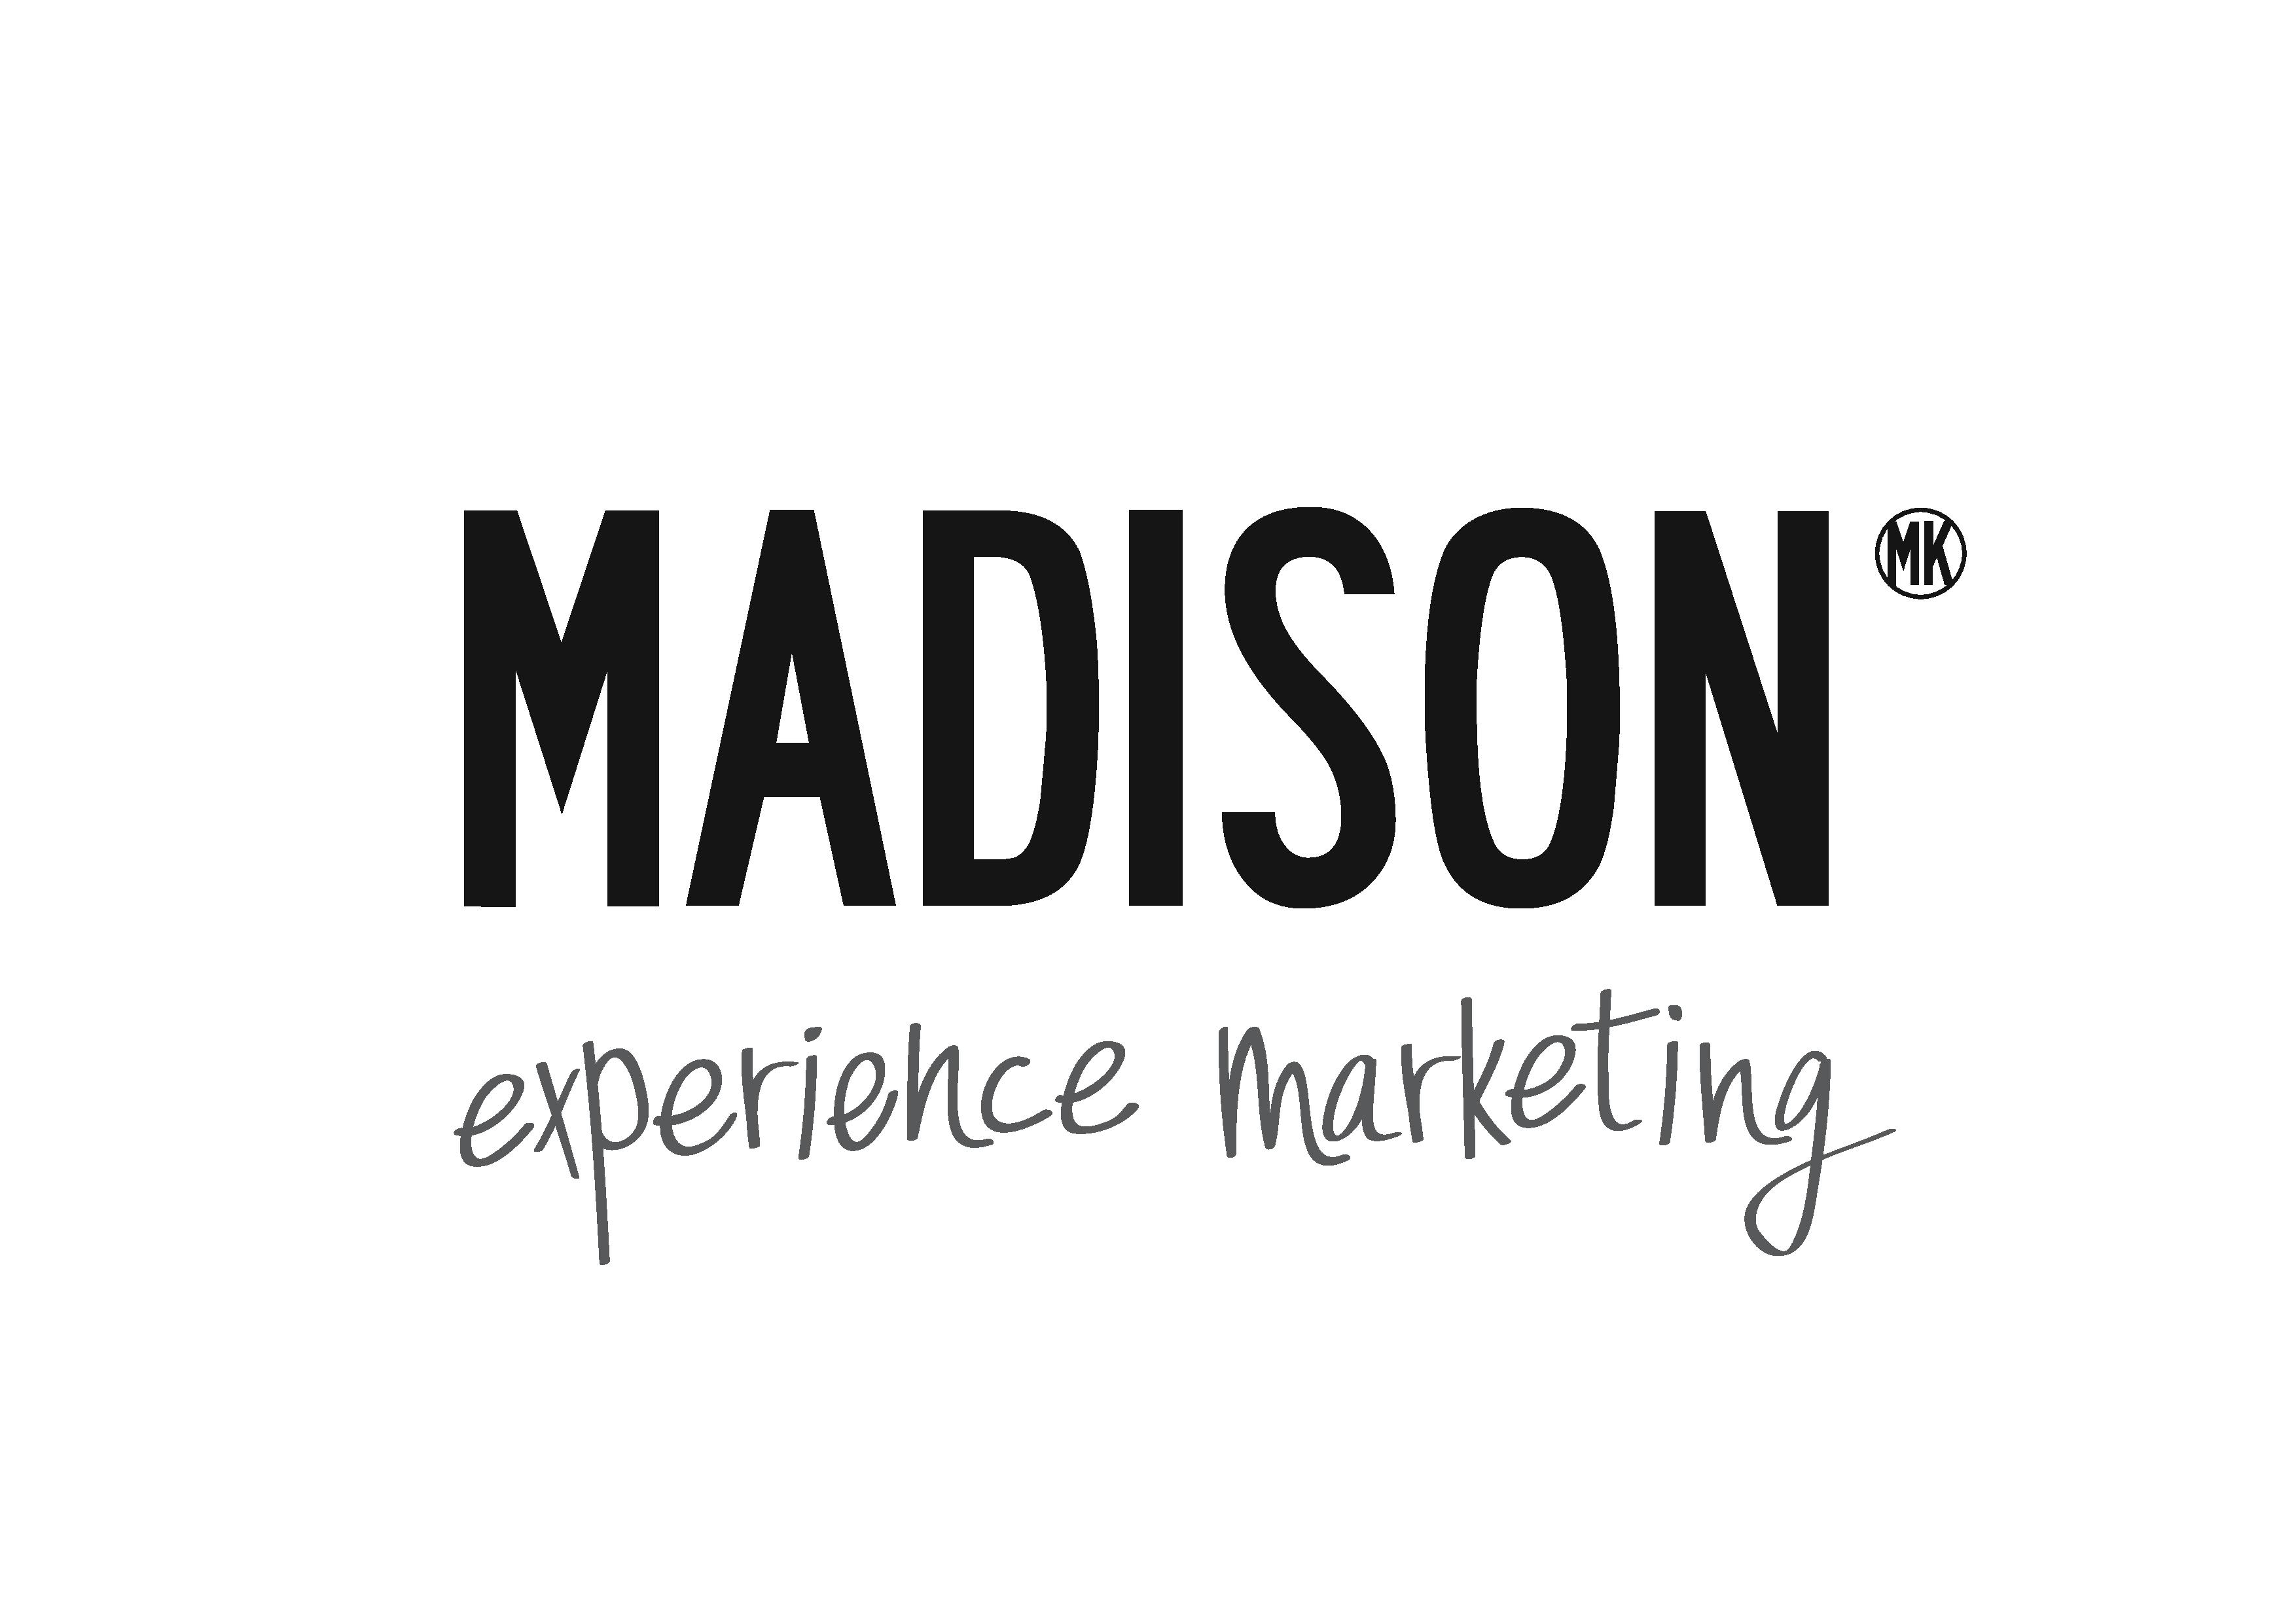 Logo de MADISON MK